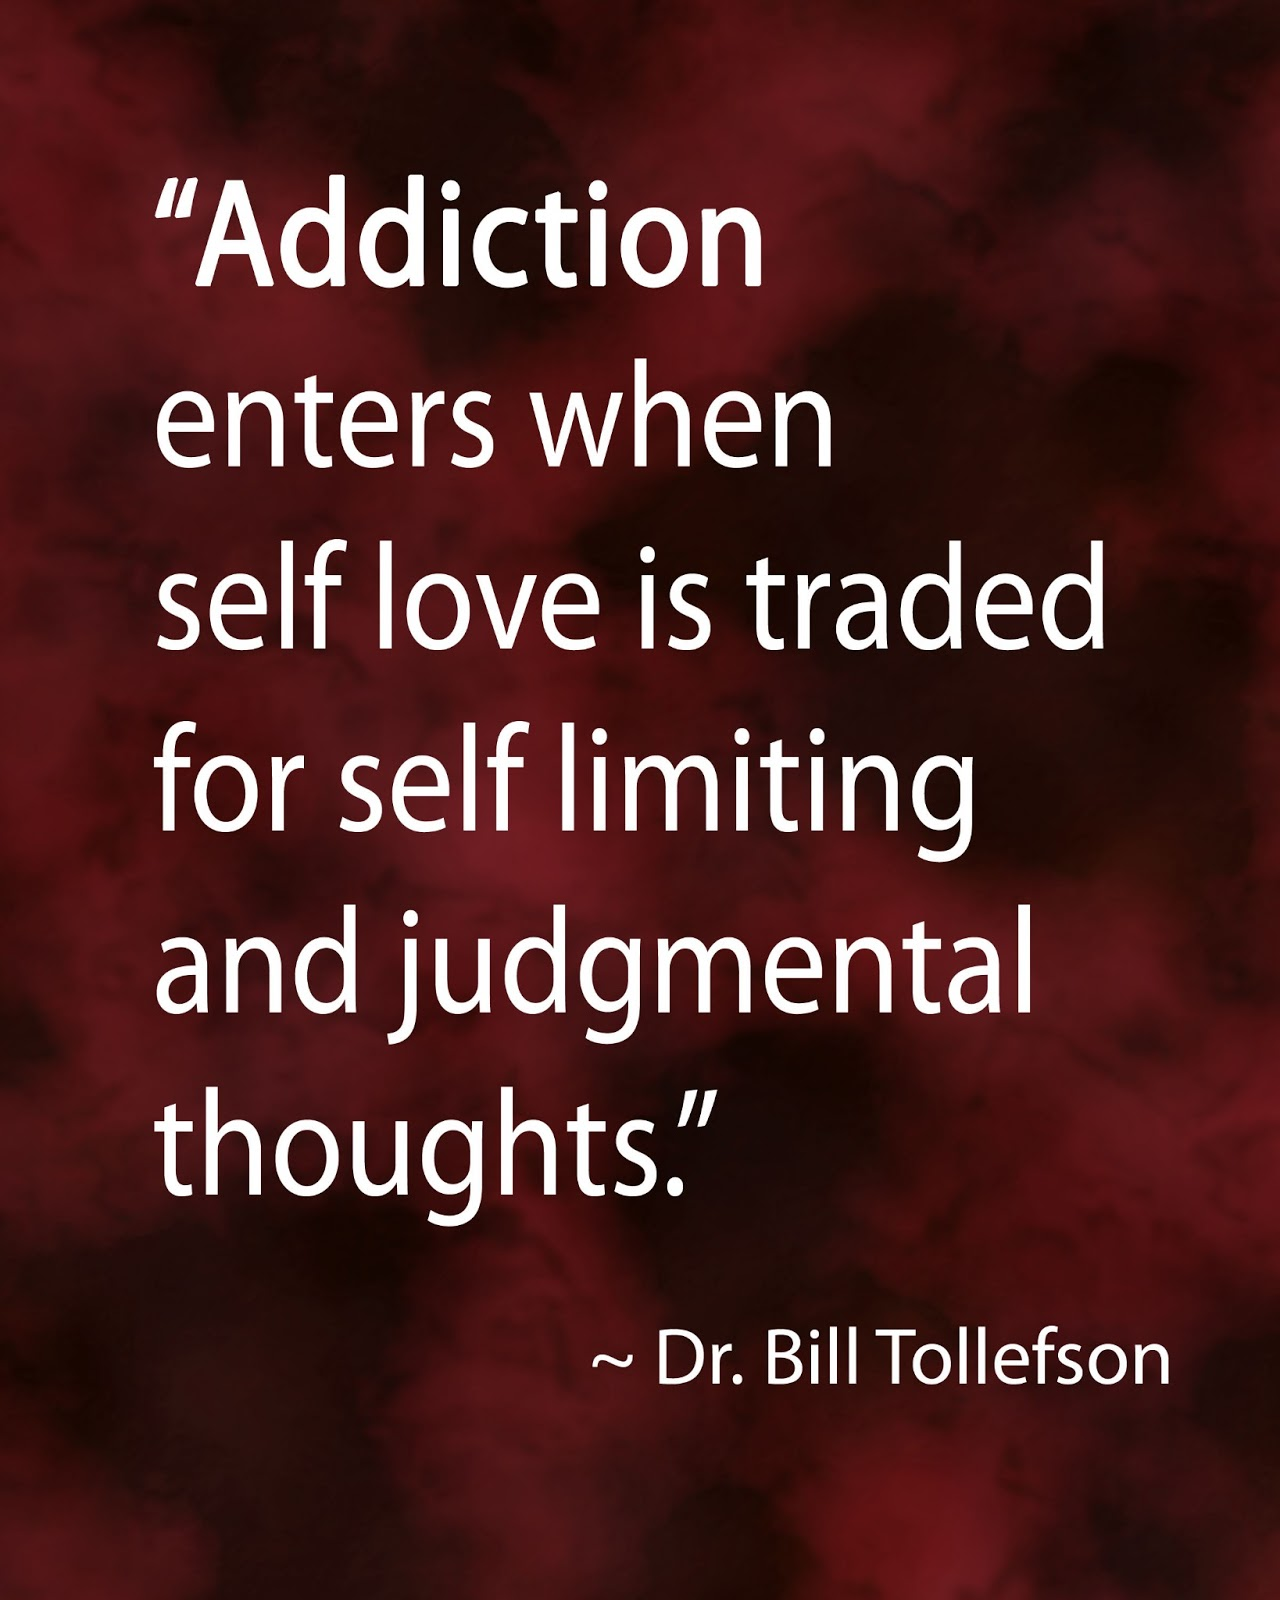 addiction recovery values